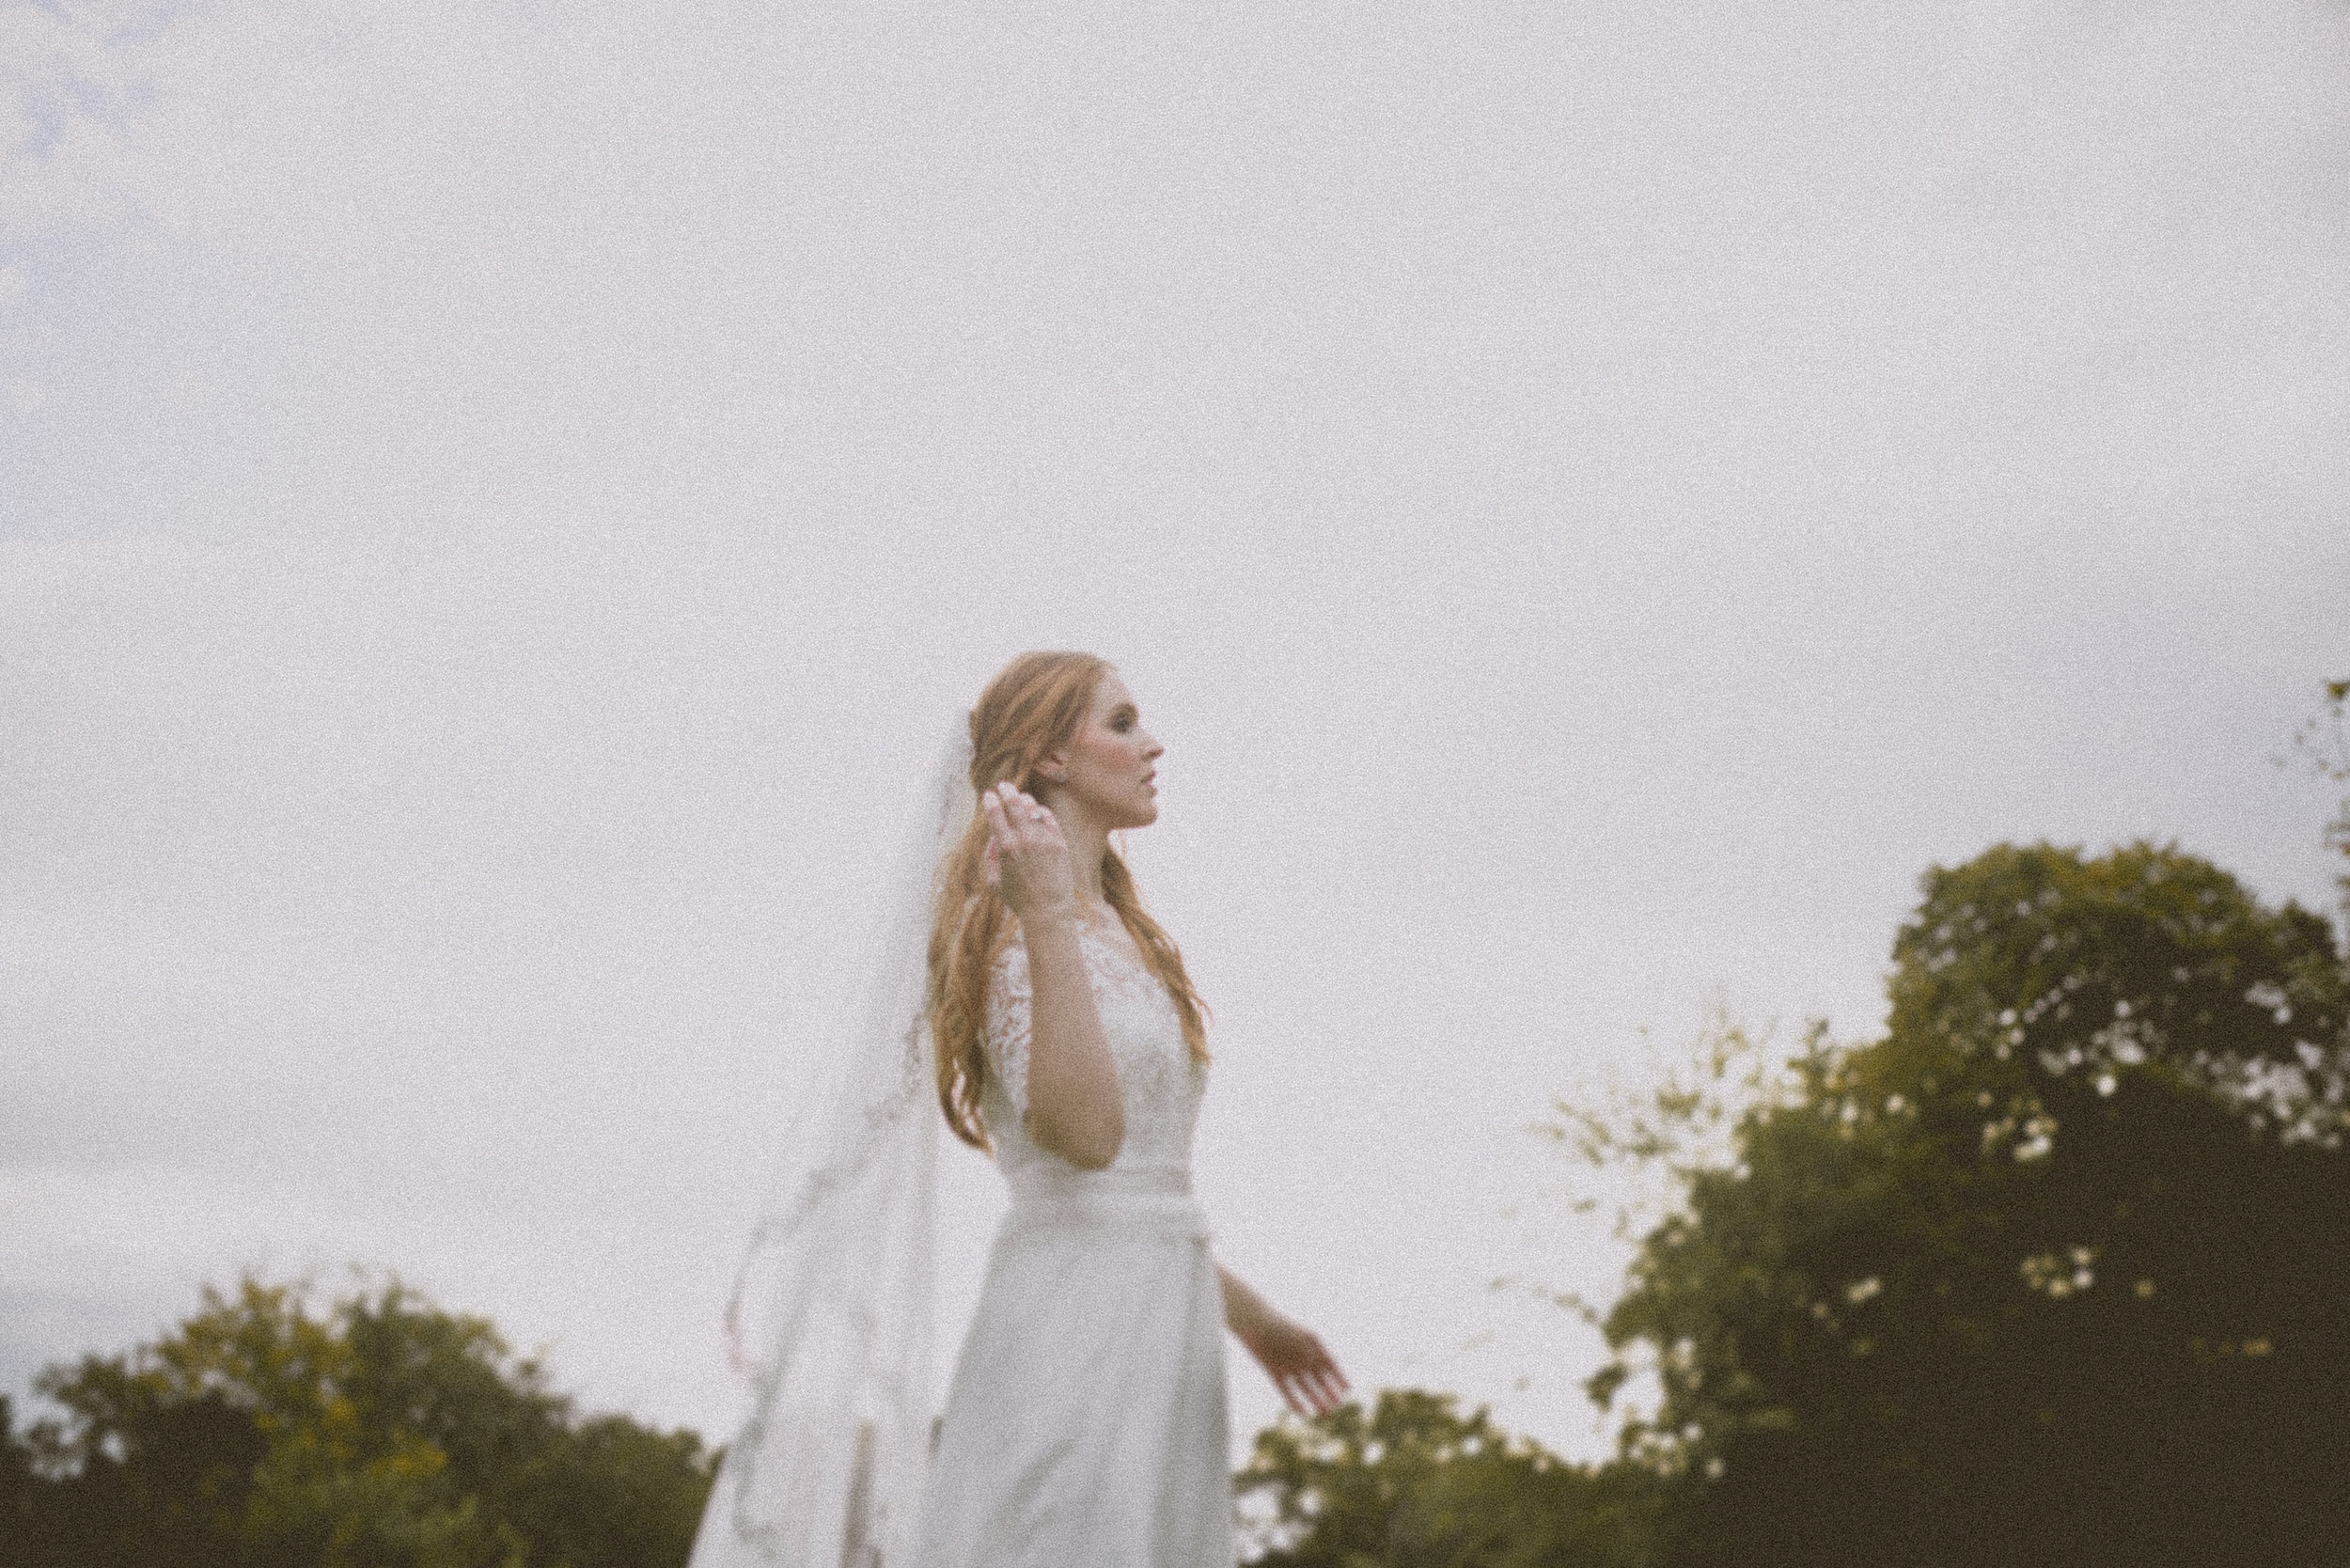 York Region Ontario Wedding Photographer - Bride + Groom-42.jpg